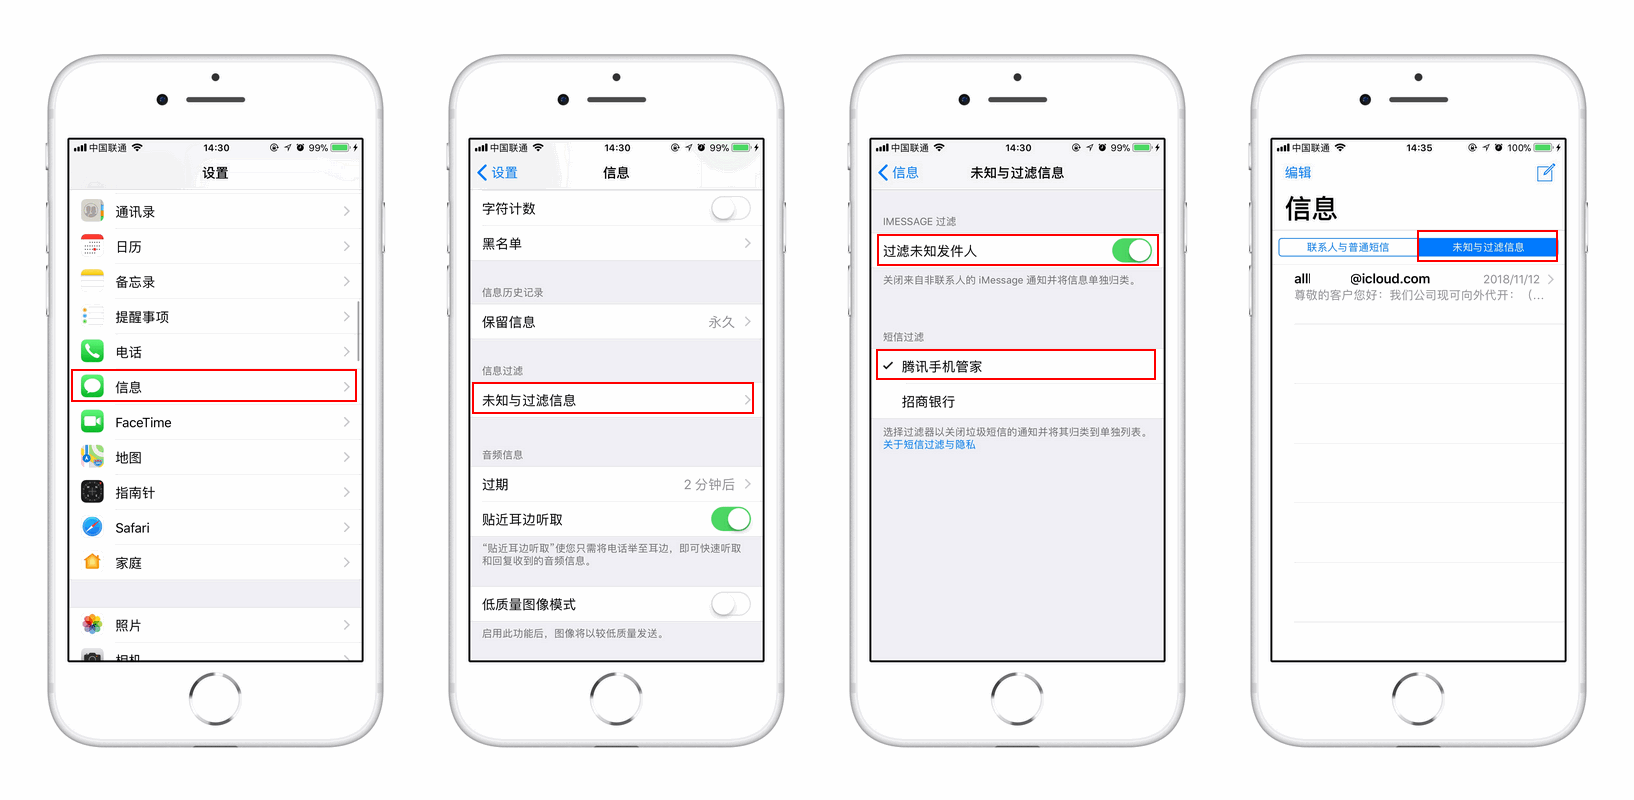 iPhone 如何屏蔽垃圾短信?